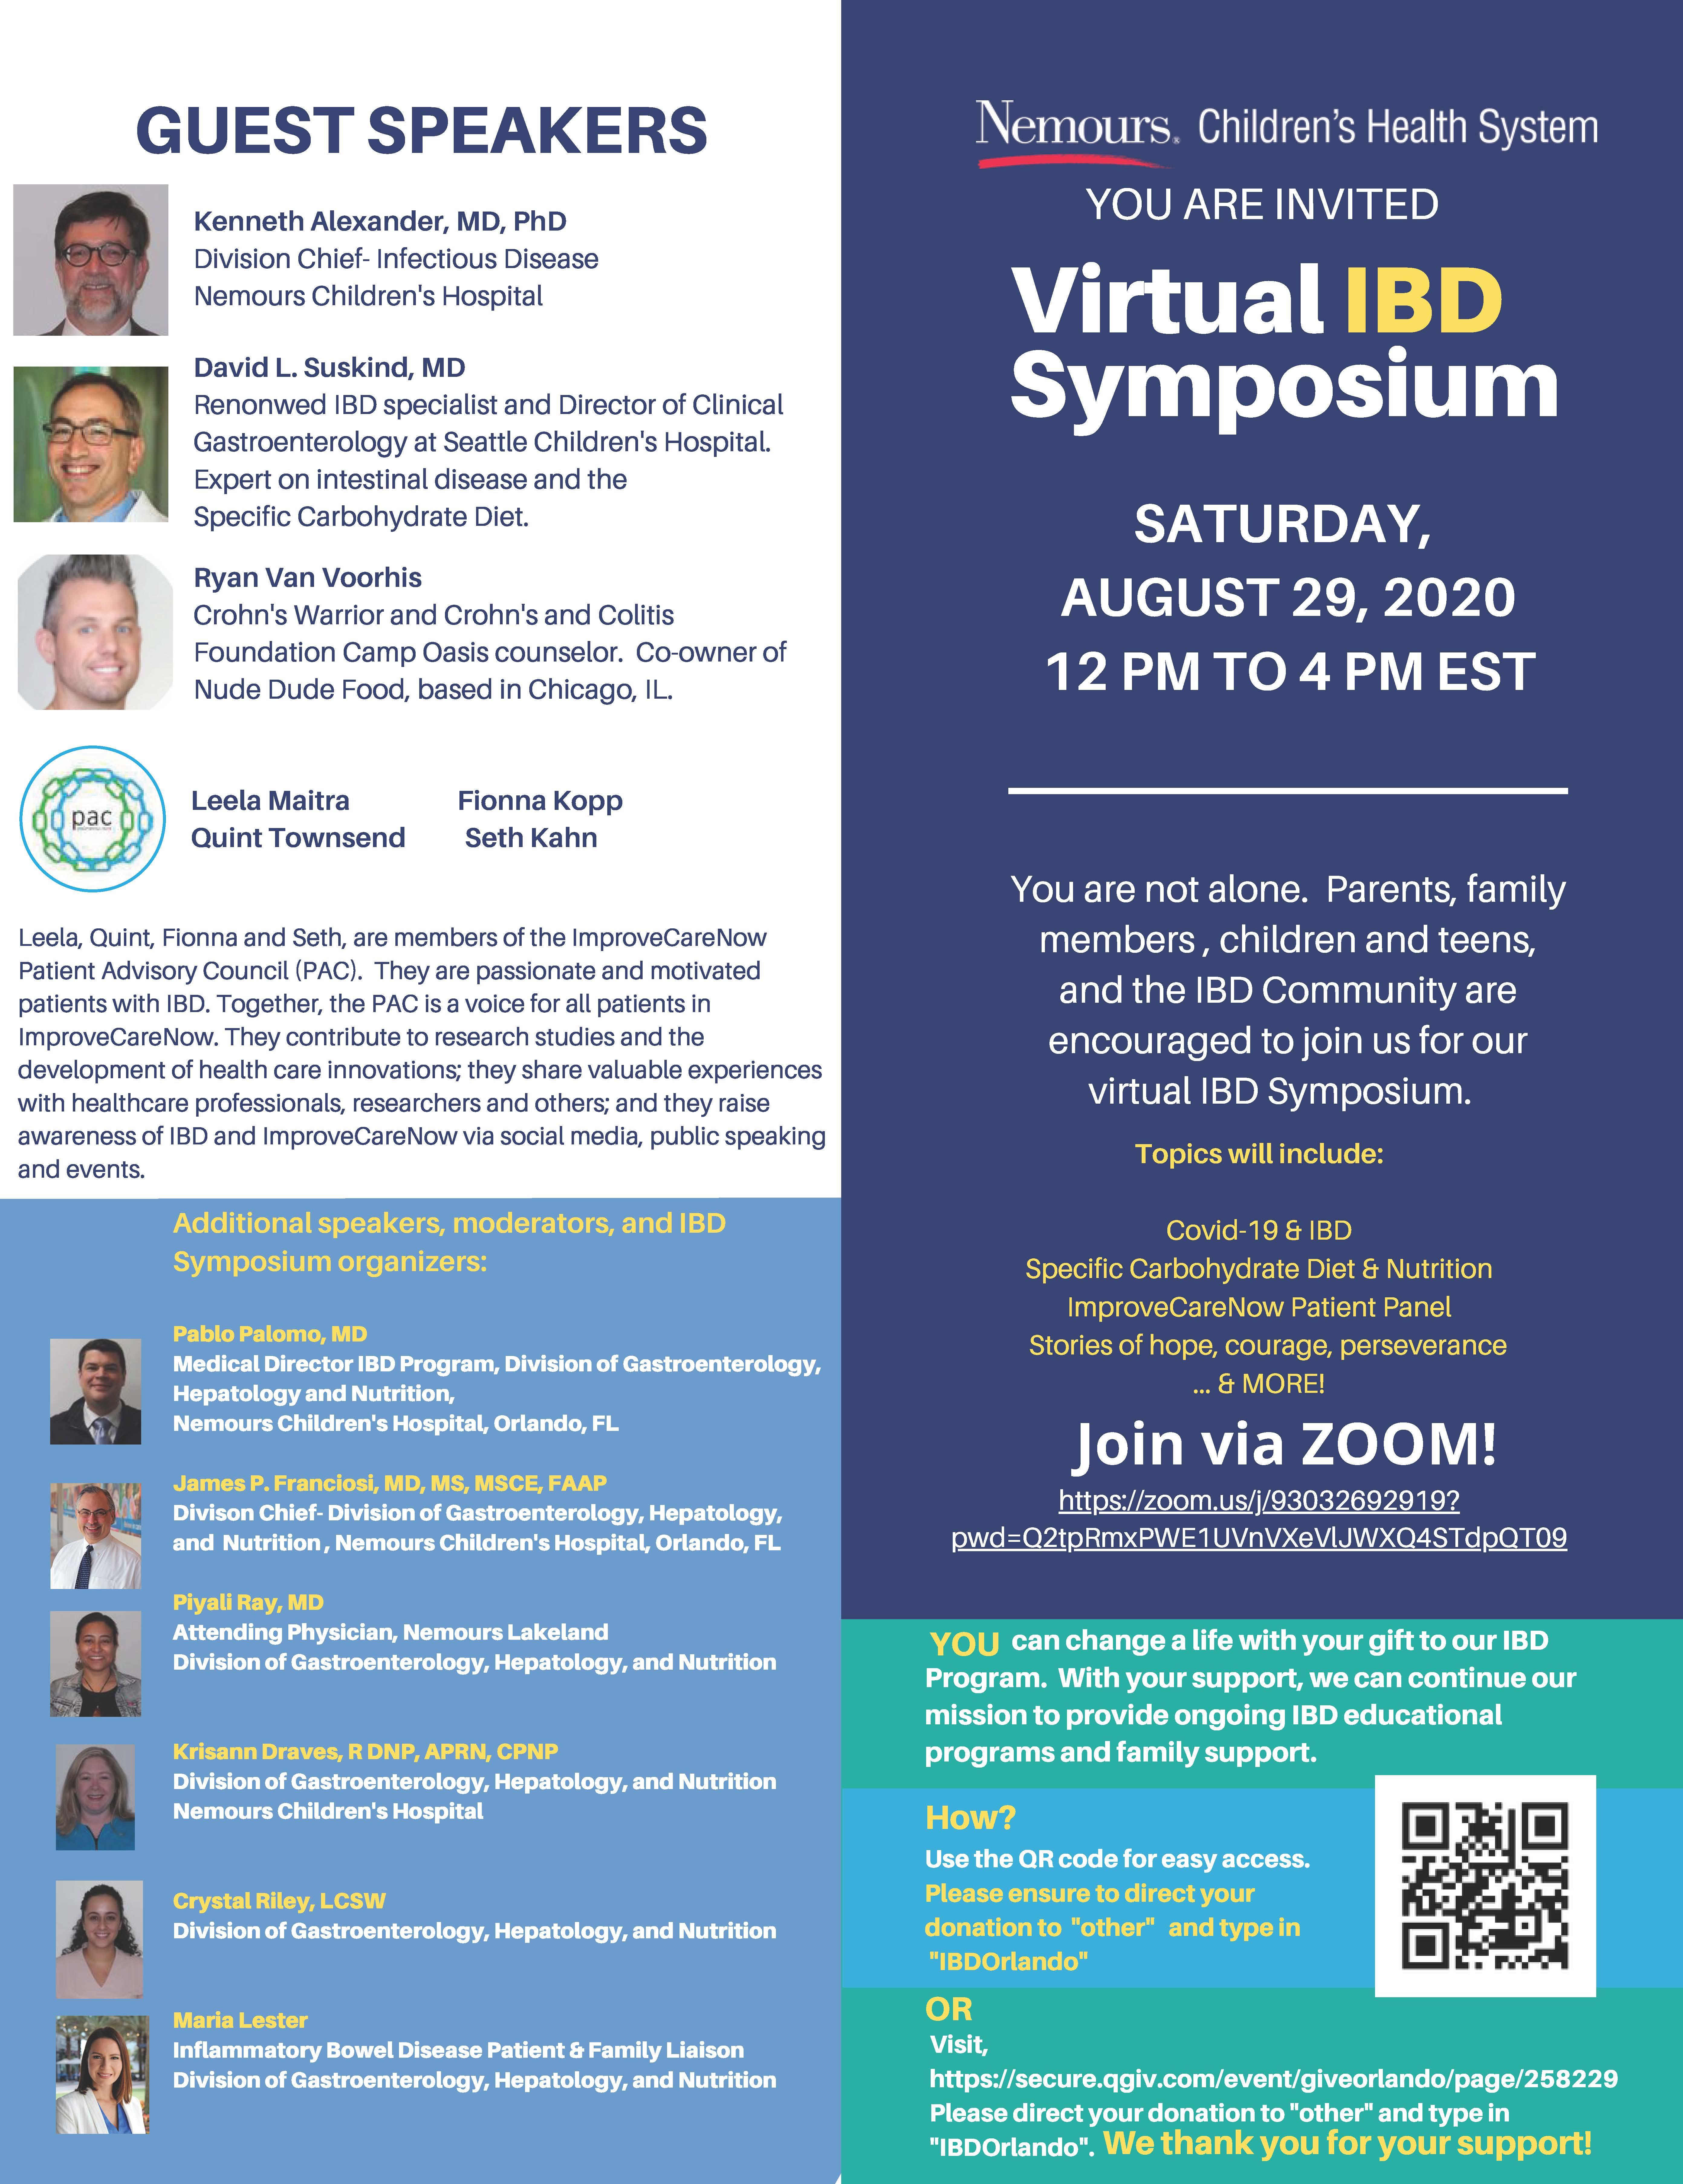 Virtual_IBD_Symposium_ML__FINAL_2020.jpg